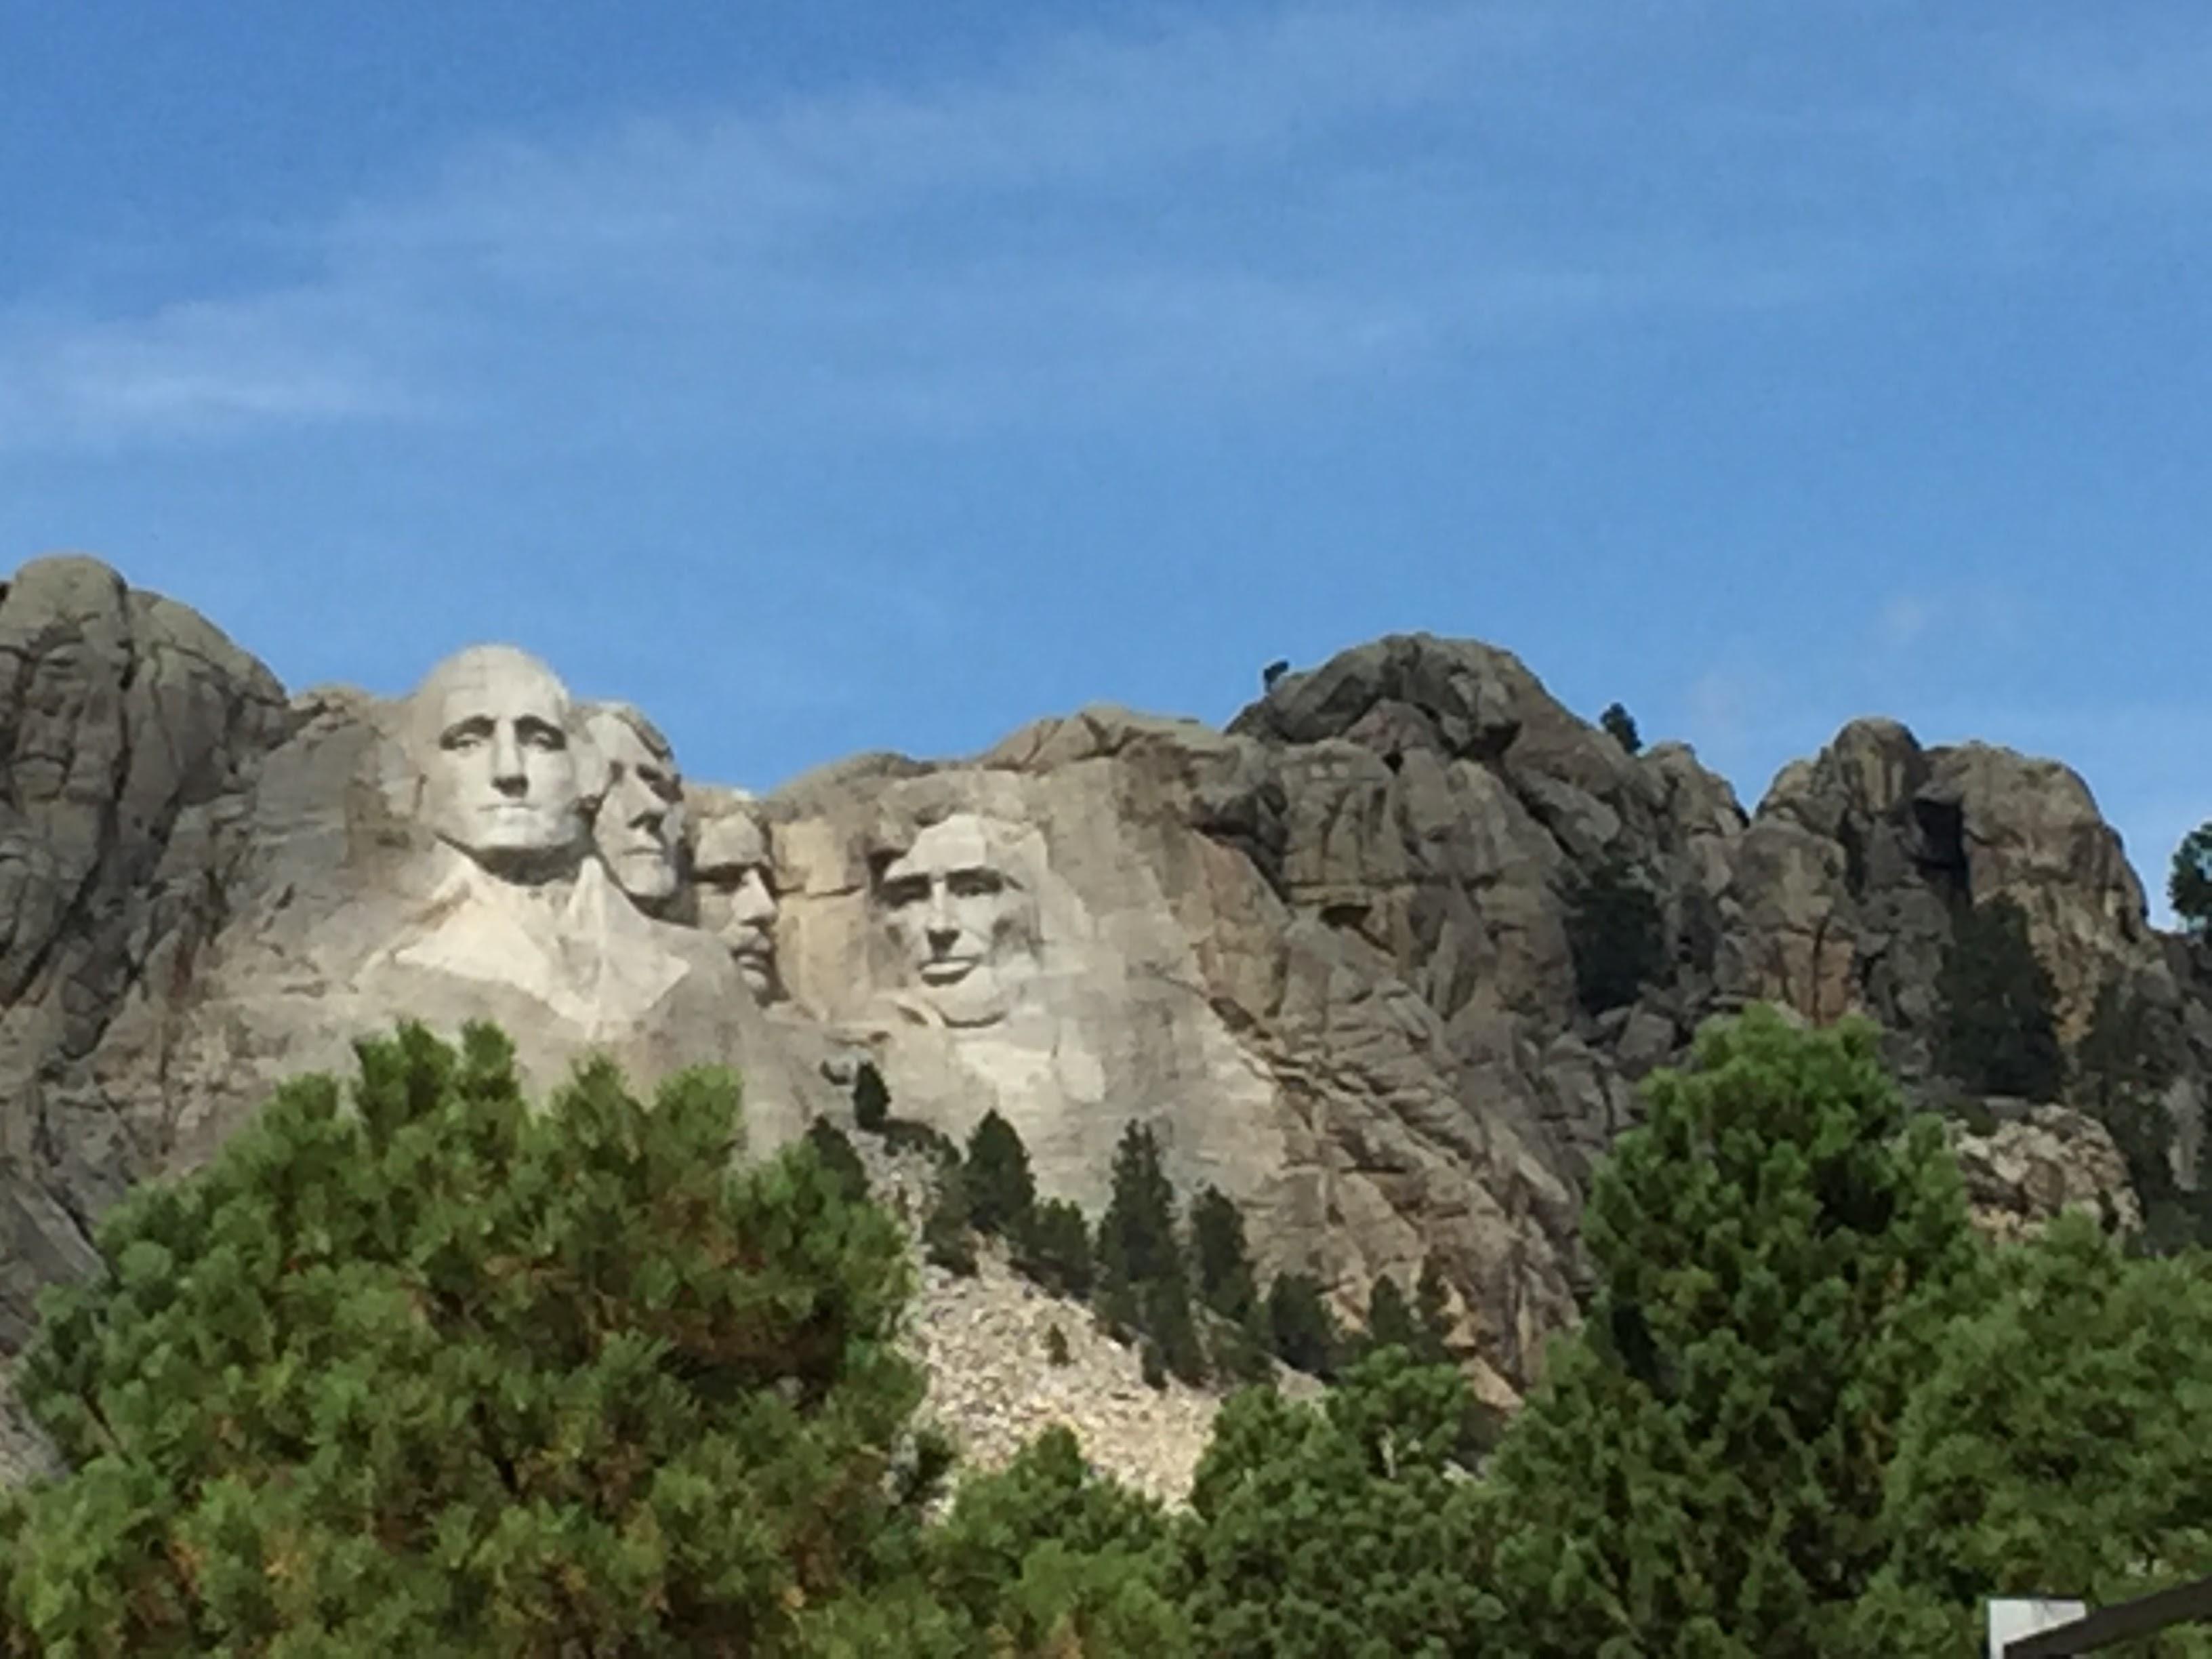 2017-09-17 Black Hills 21 Mt Rushmore 04